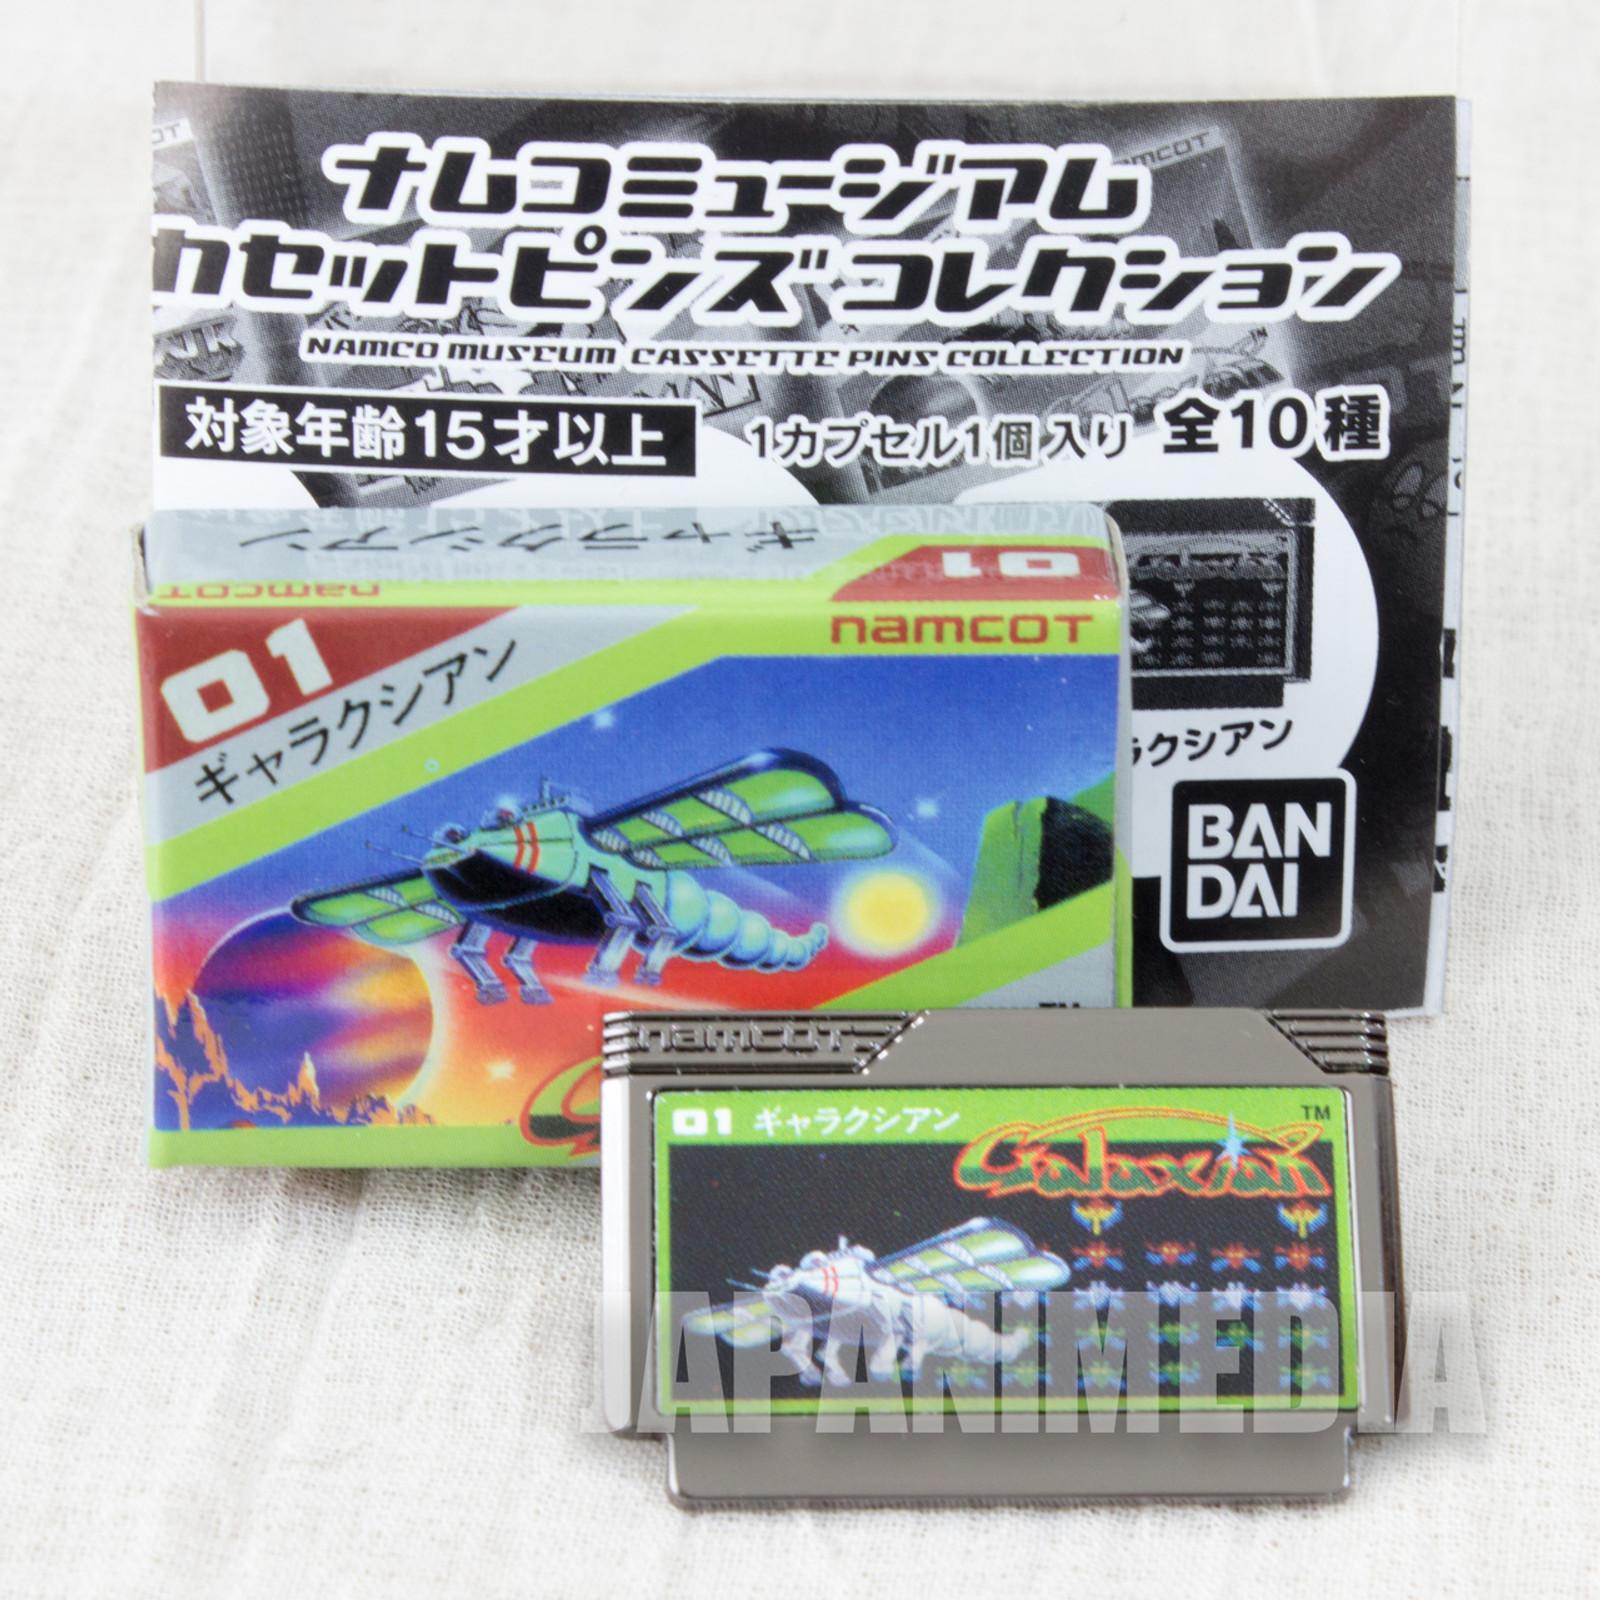 Galaxian Namco Museum Cassette Pins Collection BANDAI JAPAN FAMICOM NEC